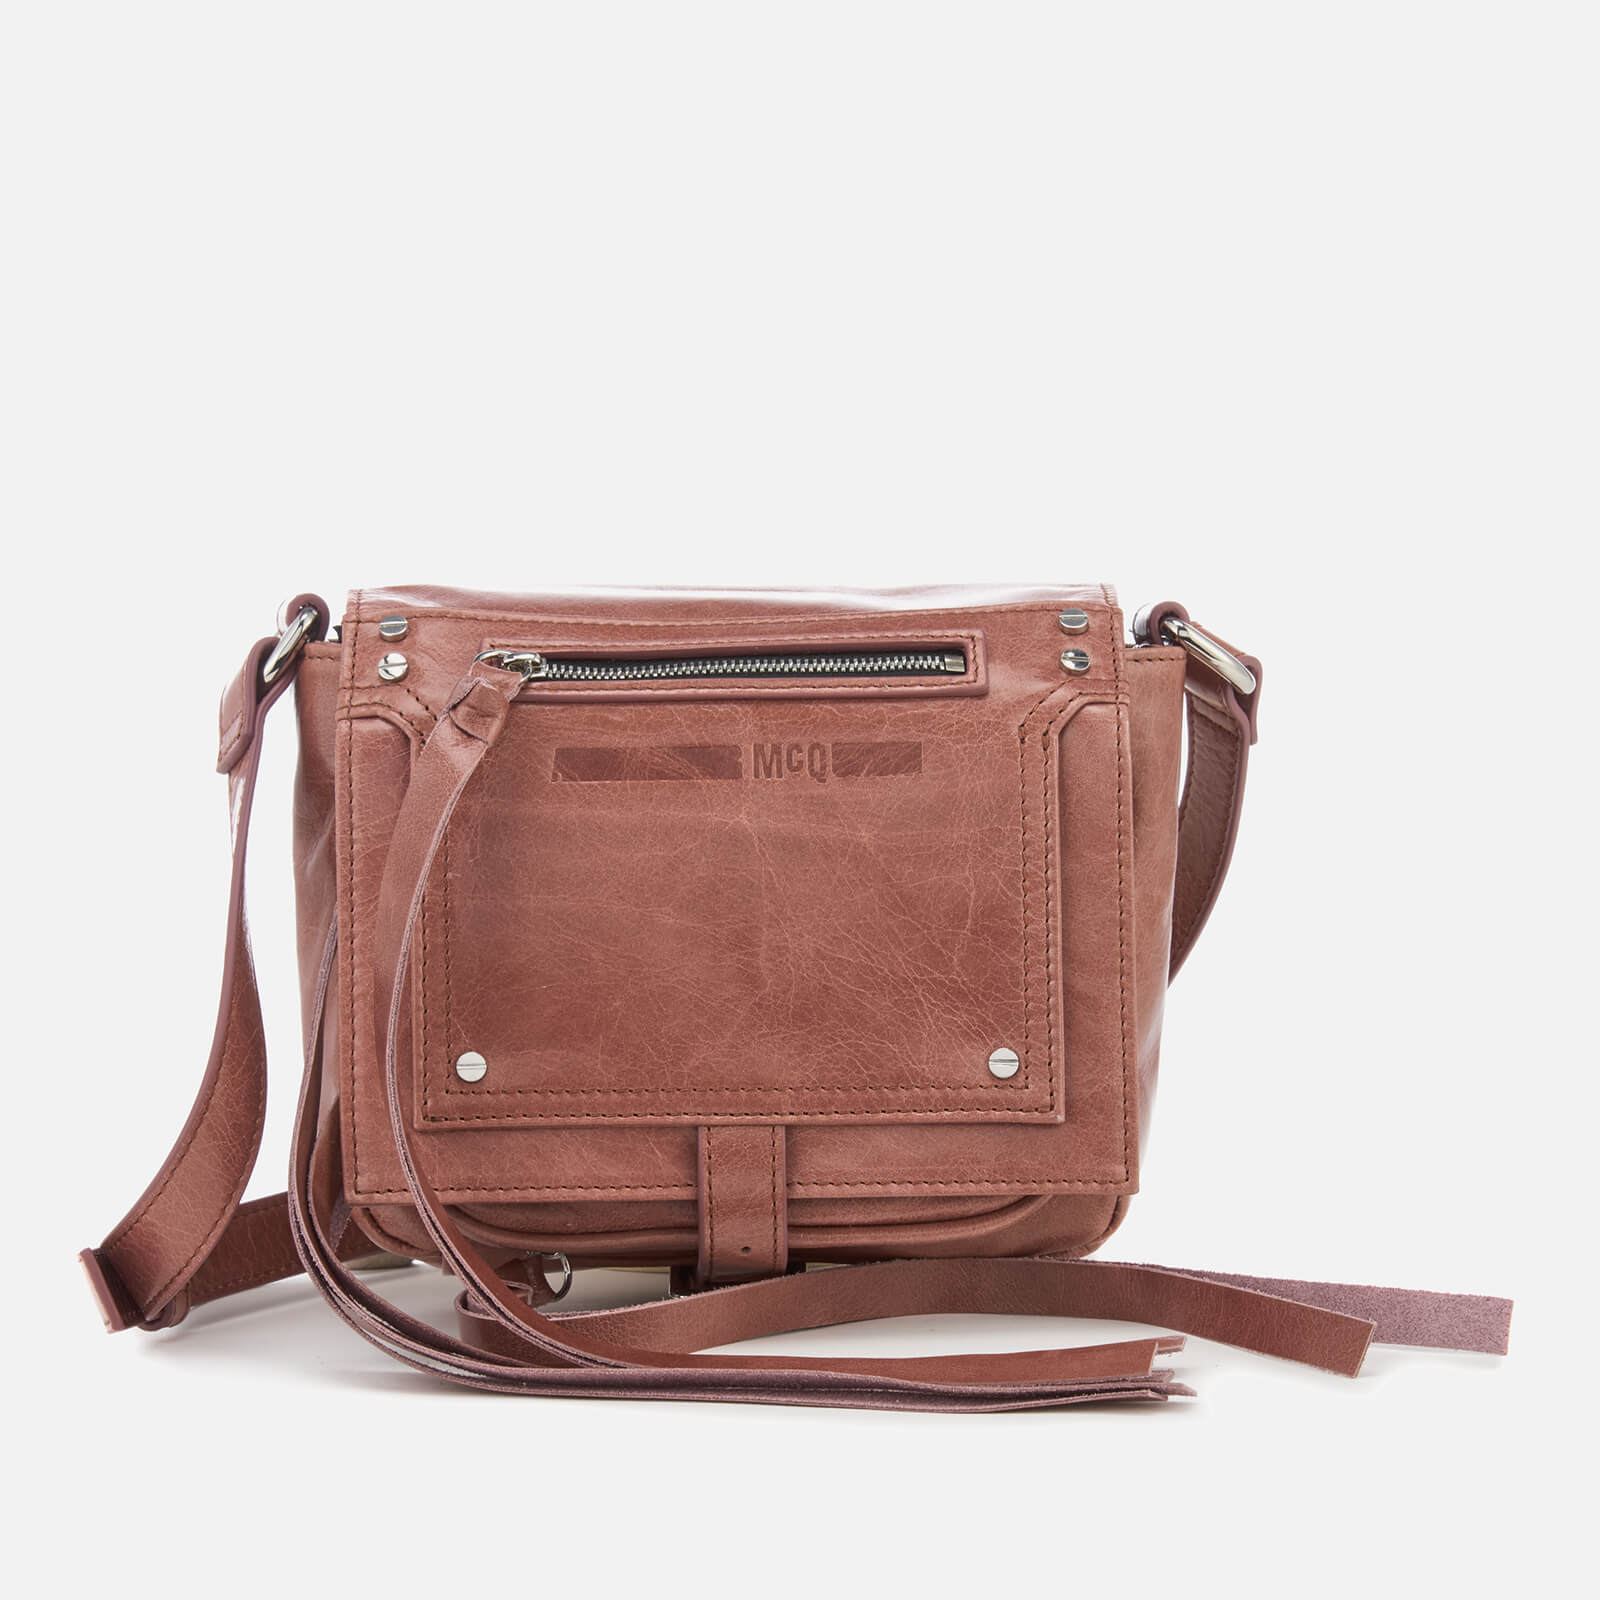 530d26573ce17 McQ Alexander McQueen Women s Loveless Mini Cross Body Bag - Dirty Pink -  Free UK Delivery over £50